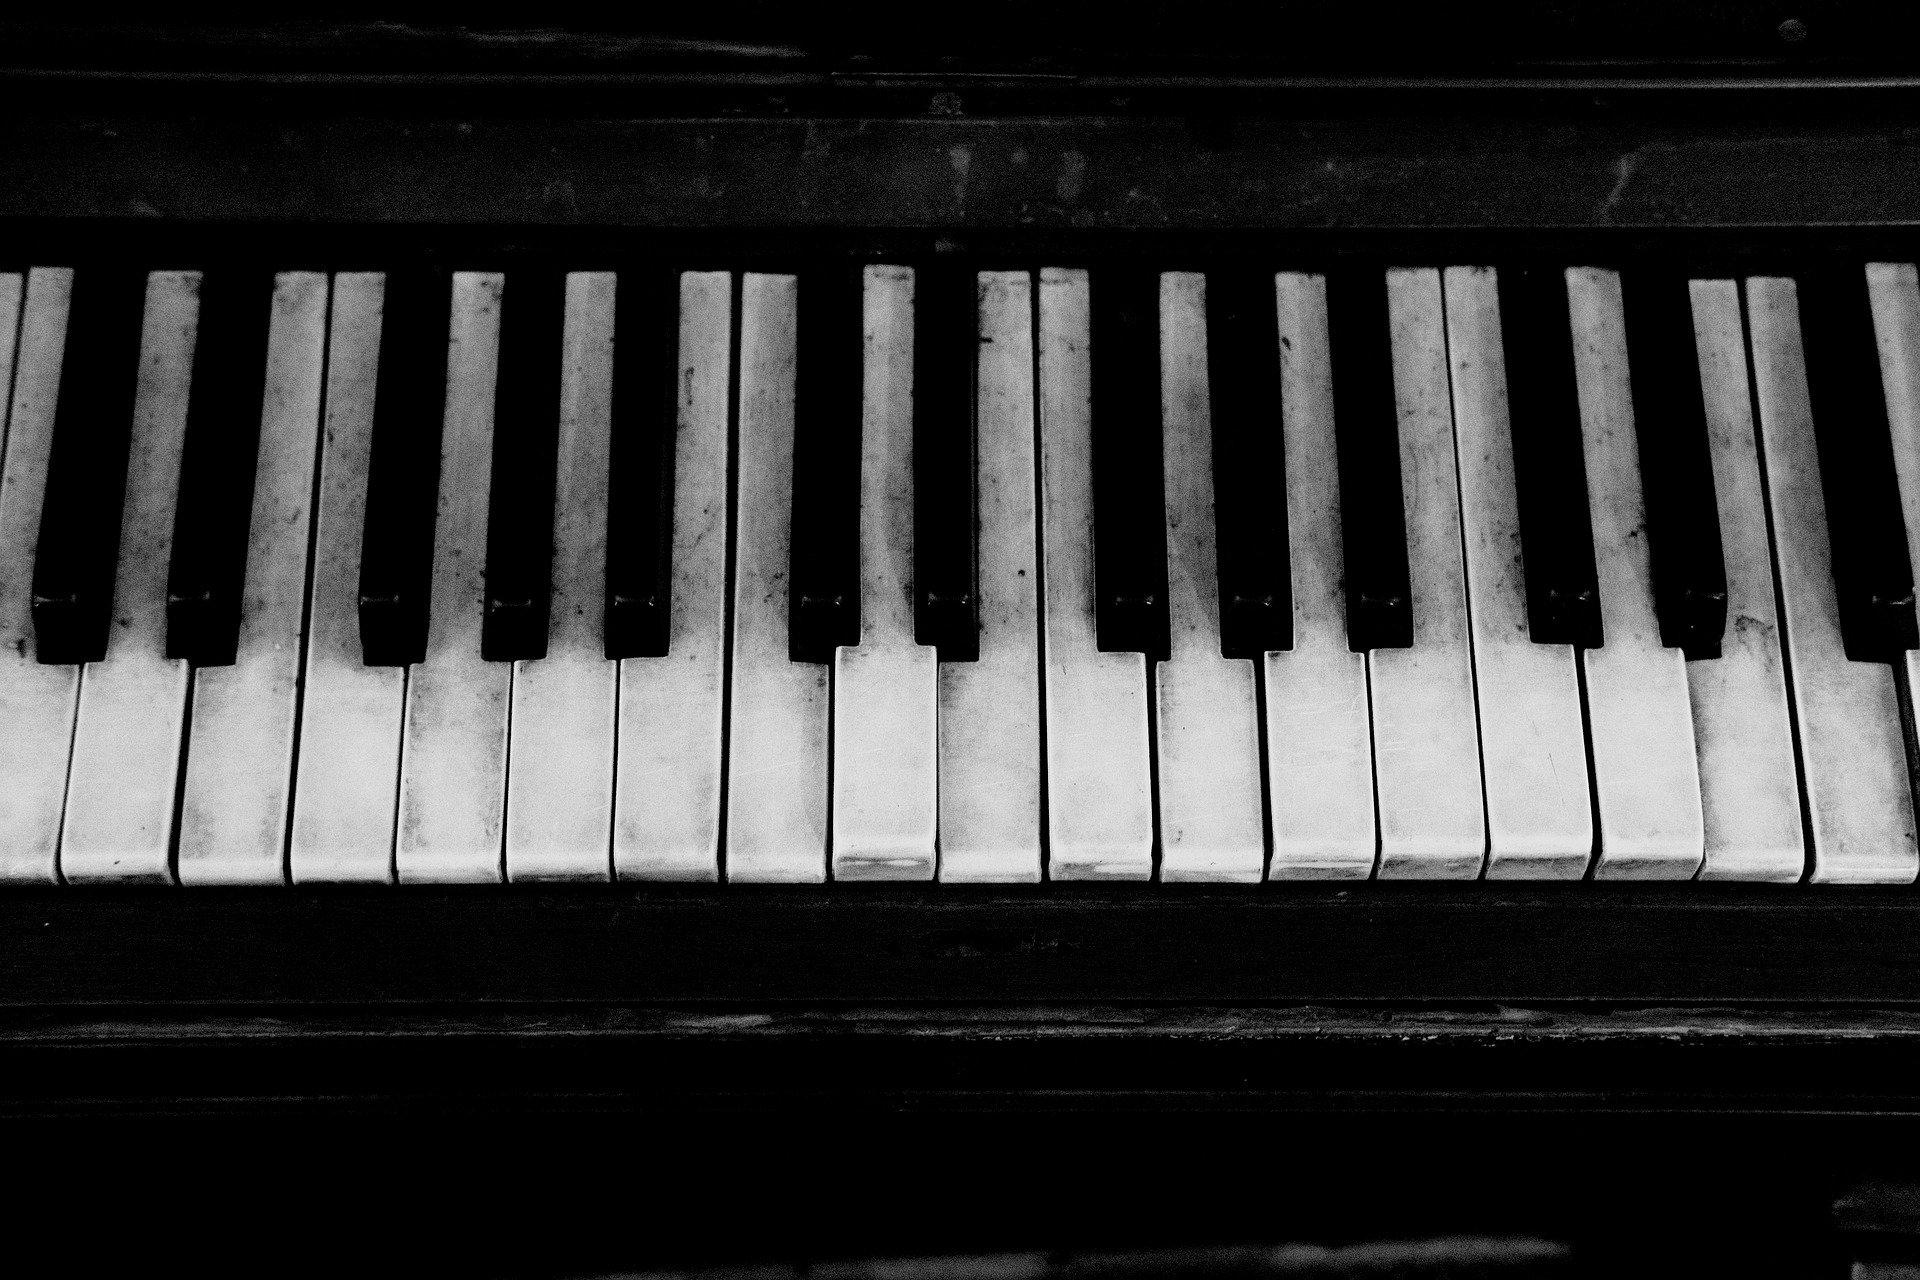 Musica jive, musica live